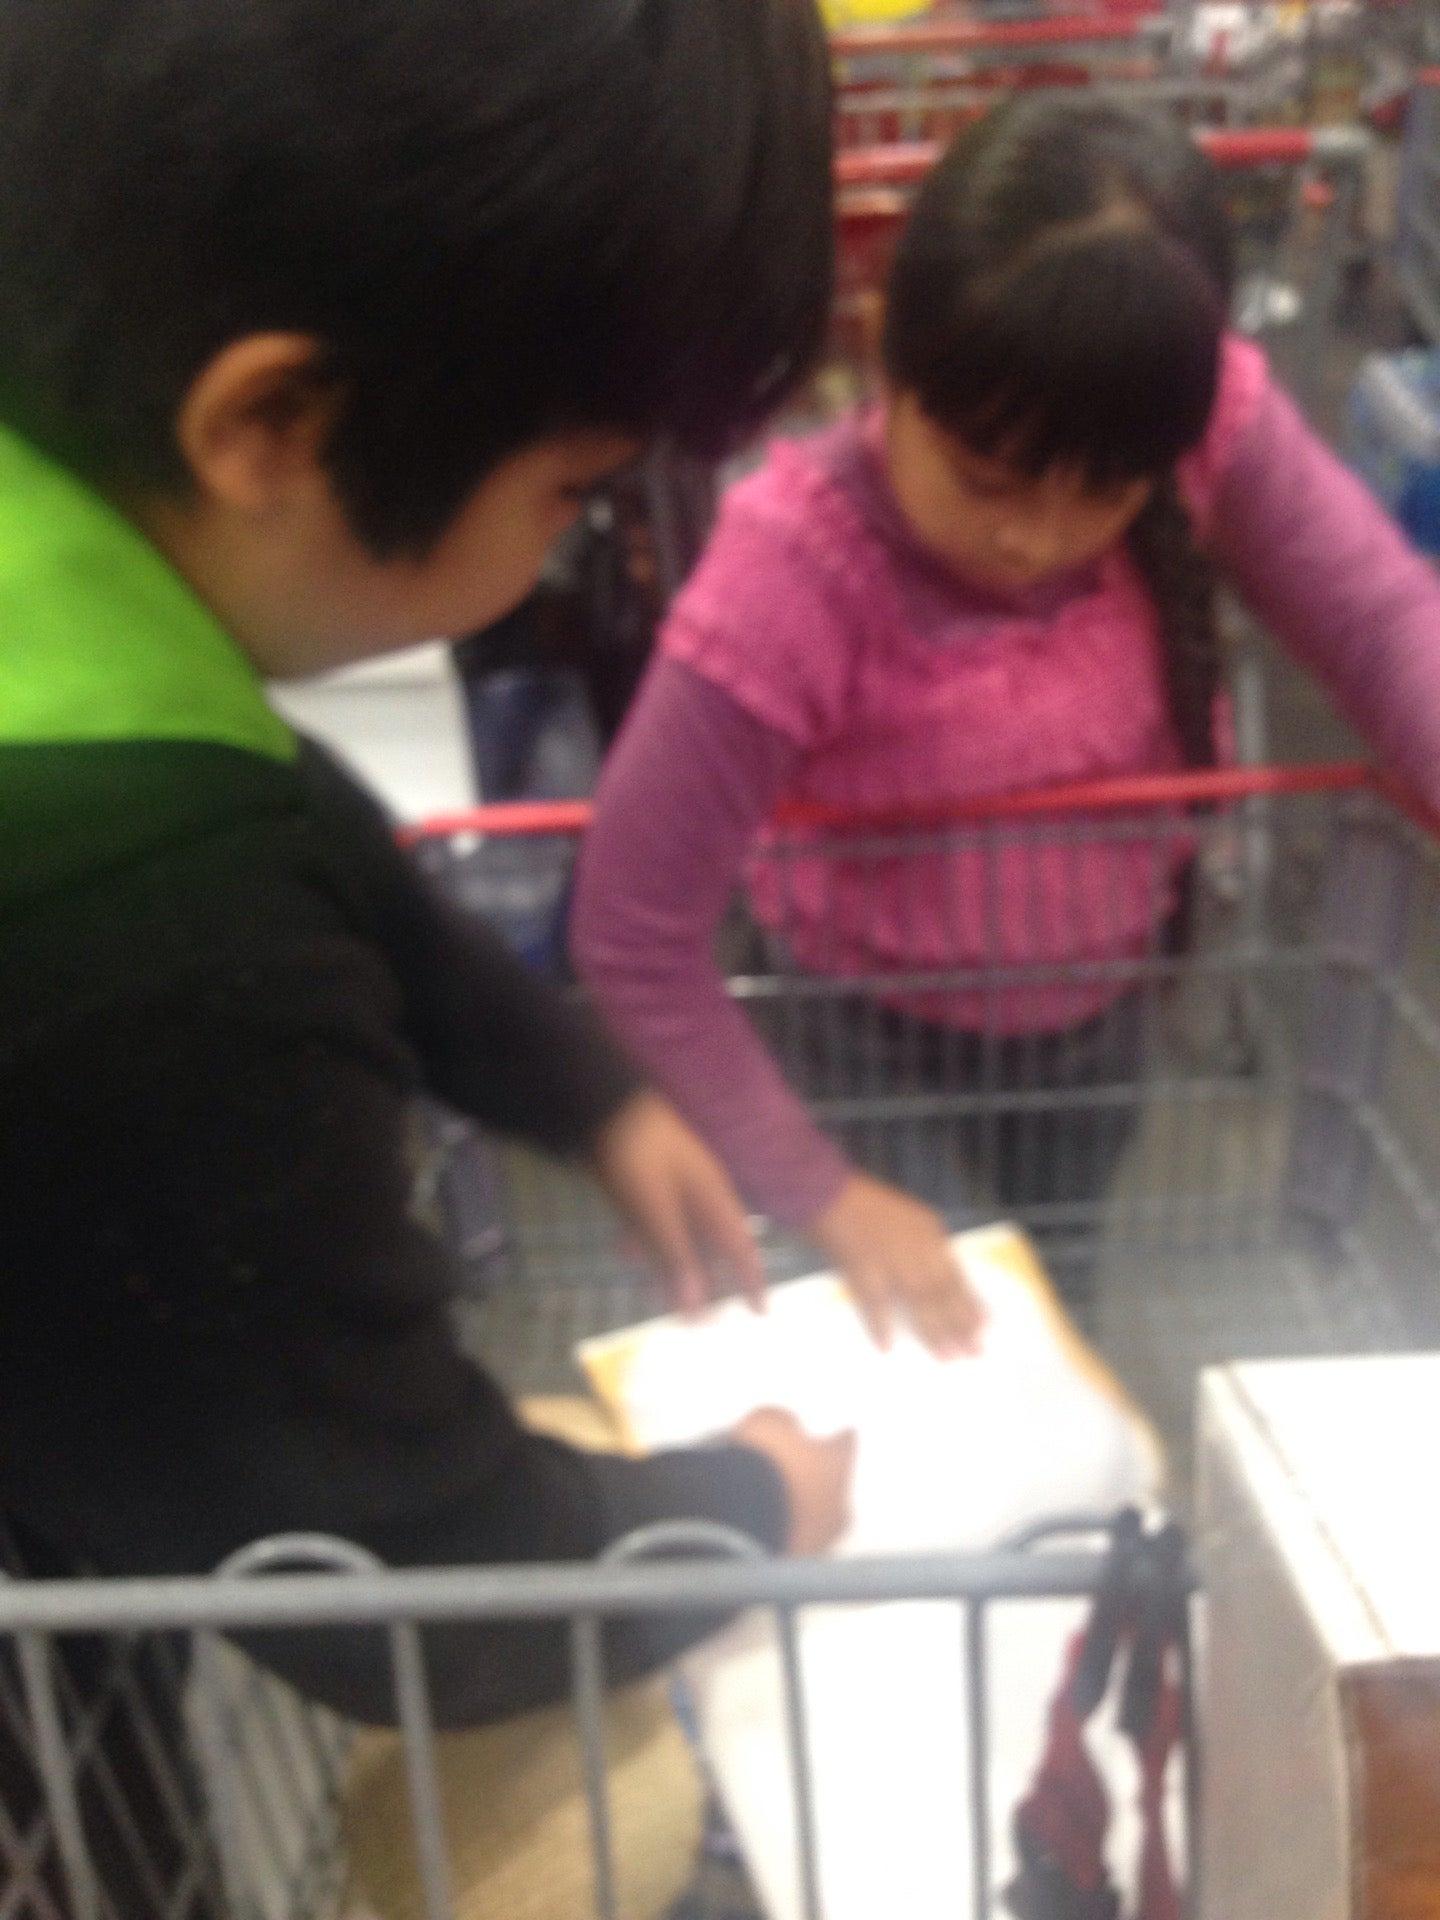 Costco Food Court in Richmond - Parent Reviews on Winnie